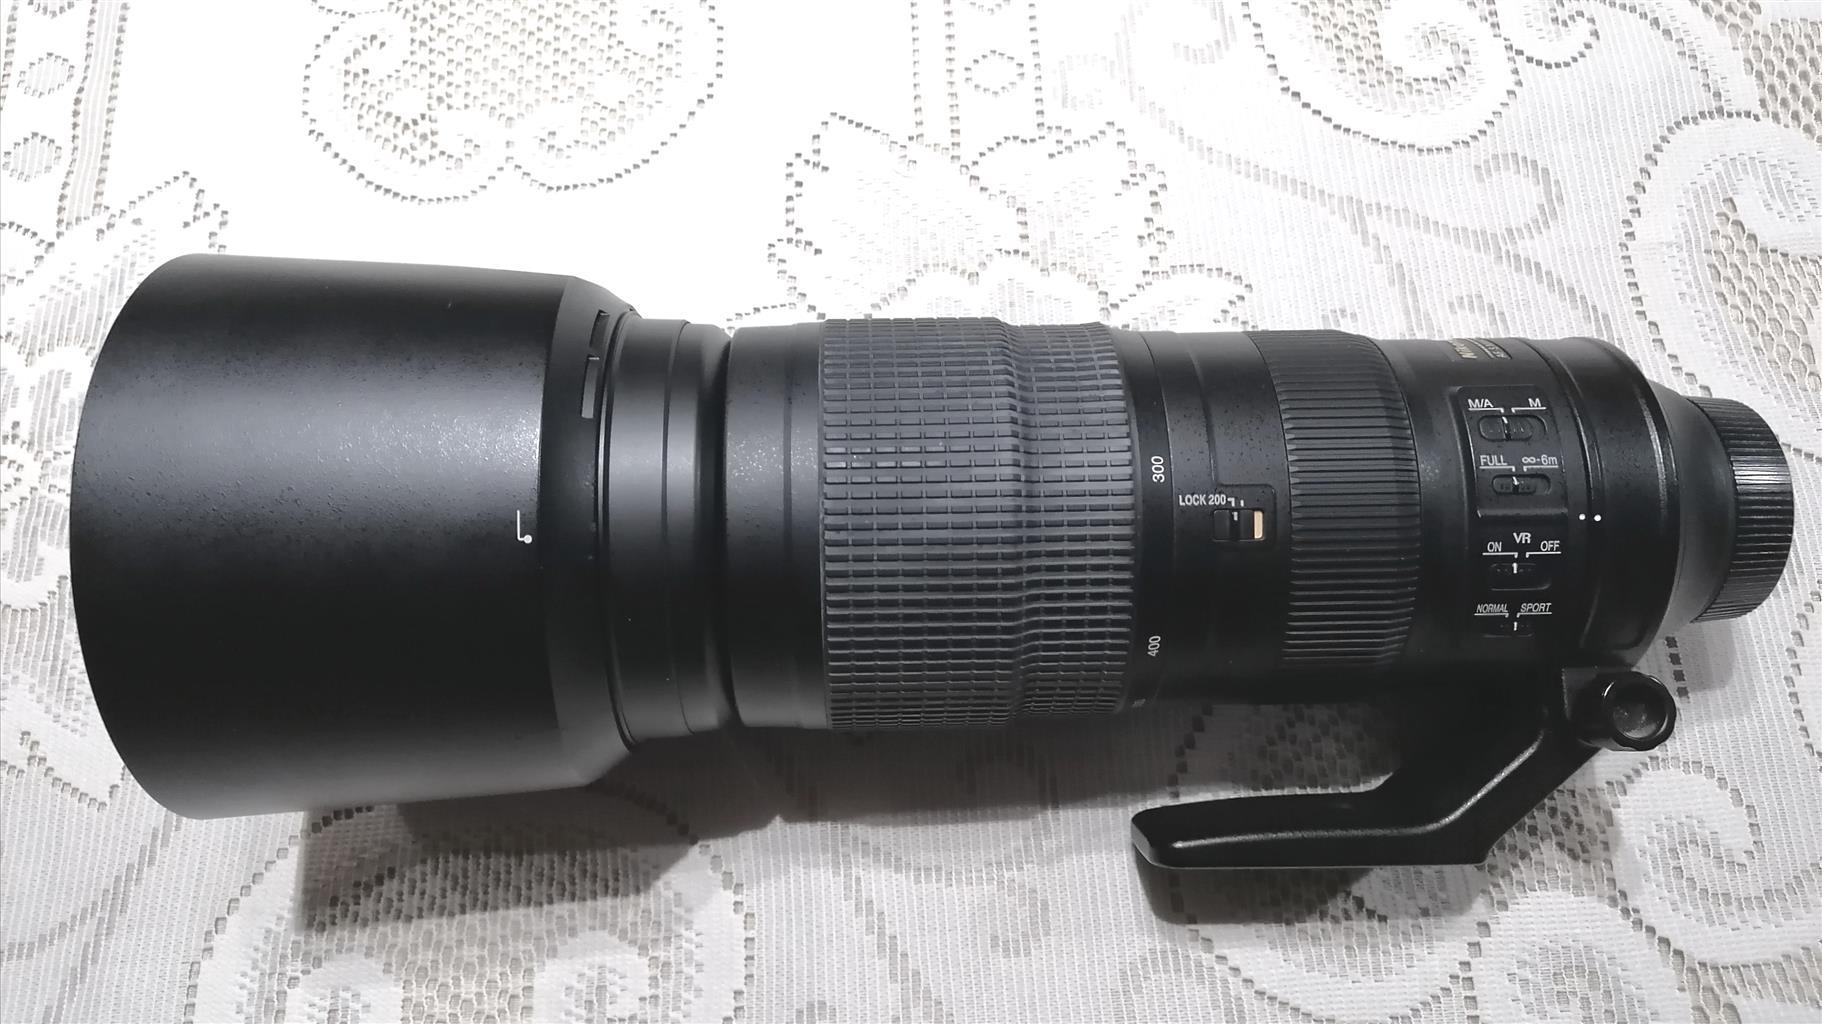 Nikon 200-500 f5.6 lens.